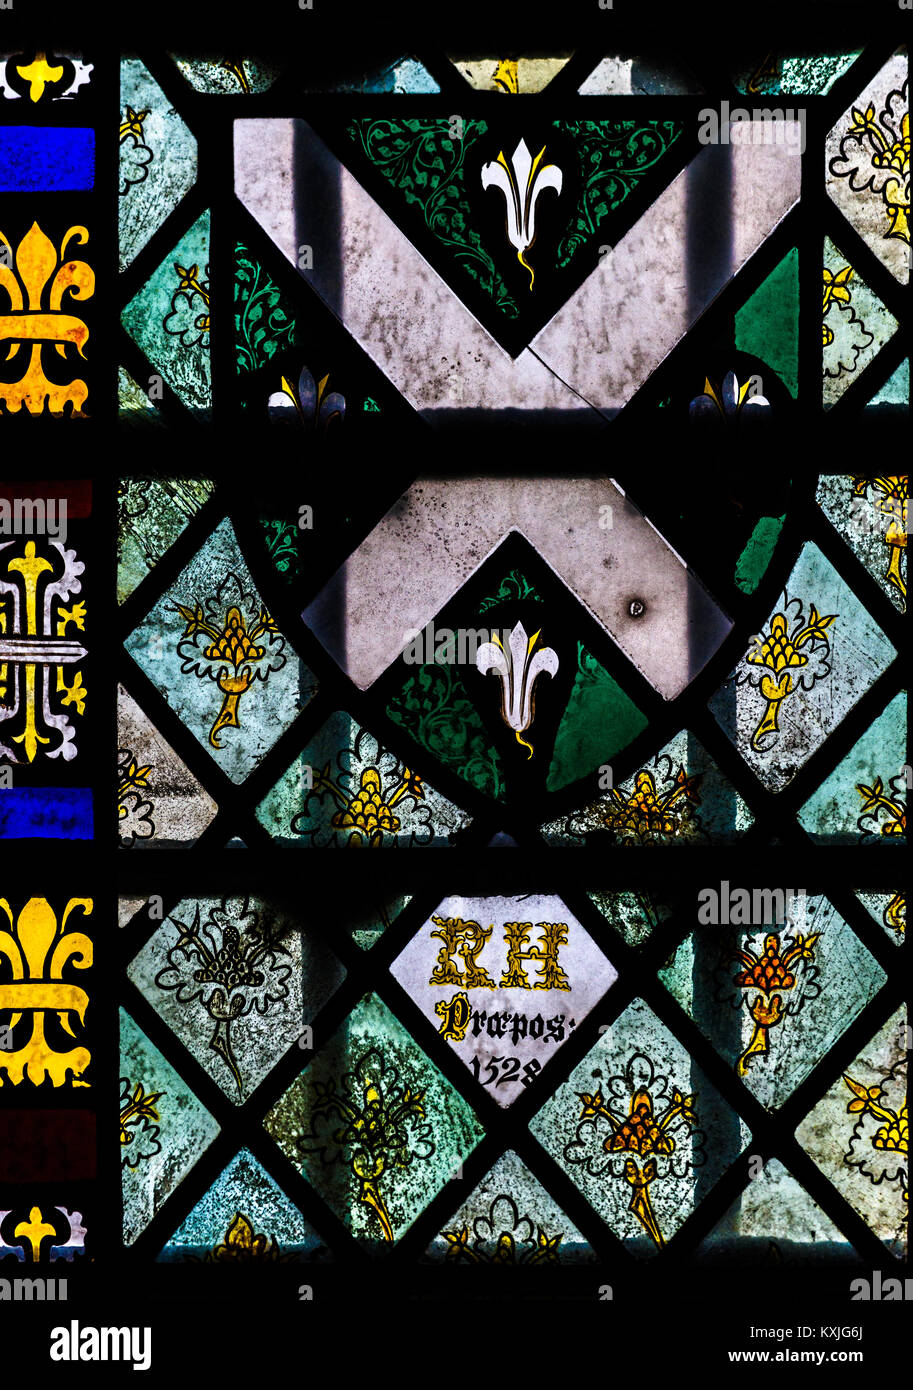 Glasfenster, datiert 1528, im Grab Kapelle, neben der ante-Kapelle, in der Kapelle des King's College, Universität Stockbild